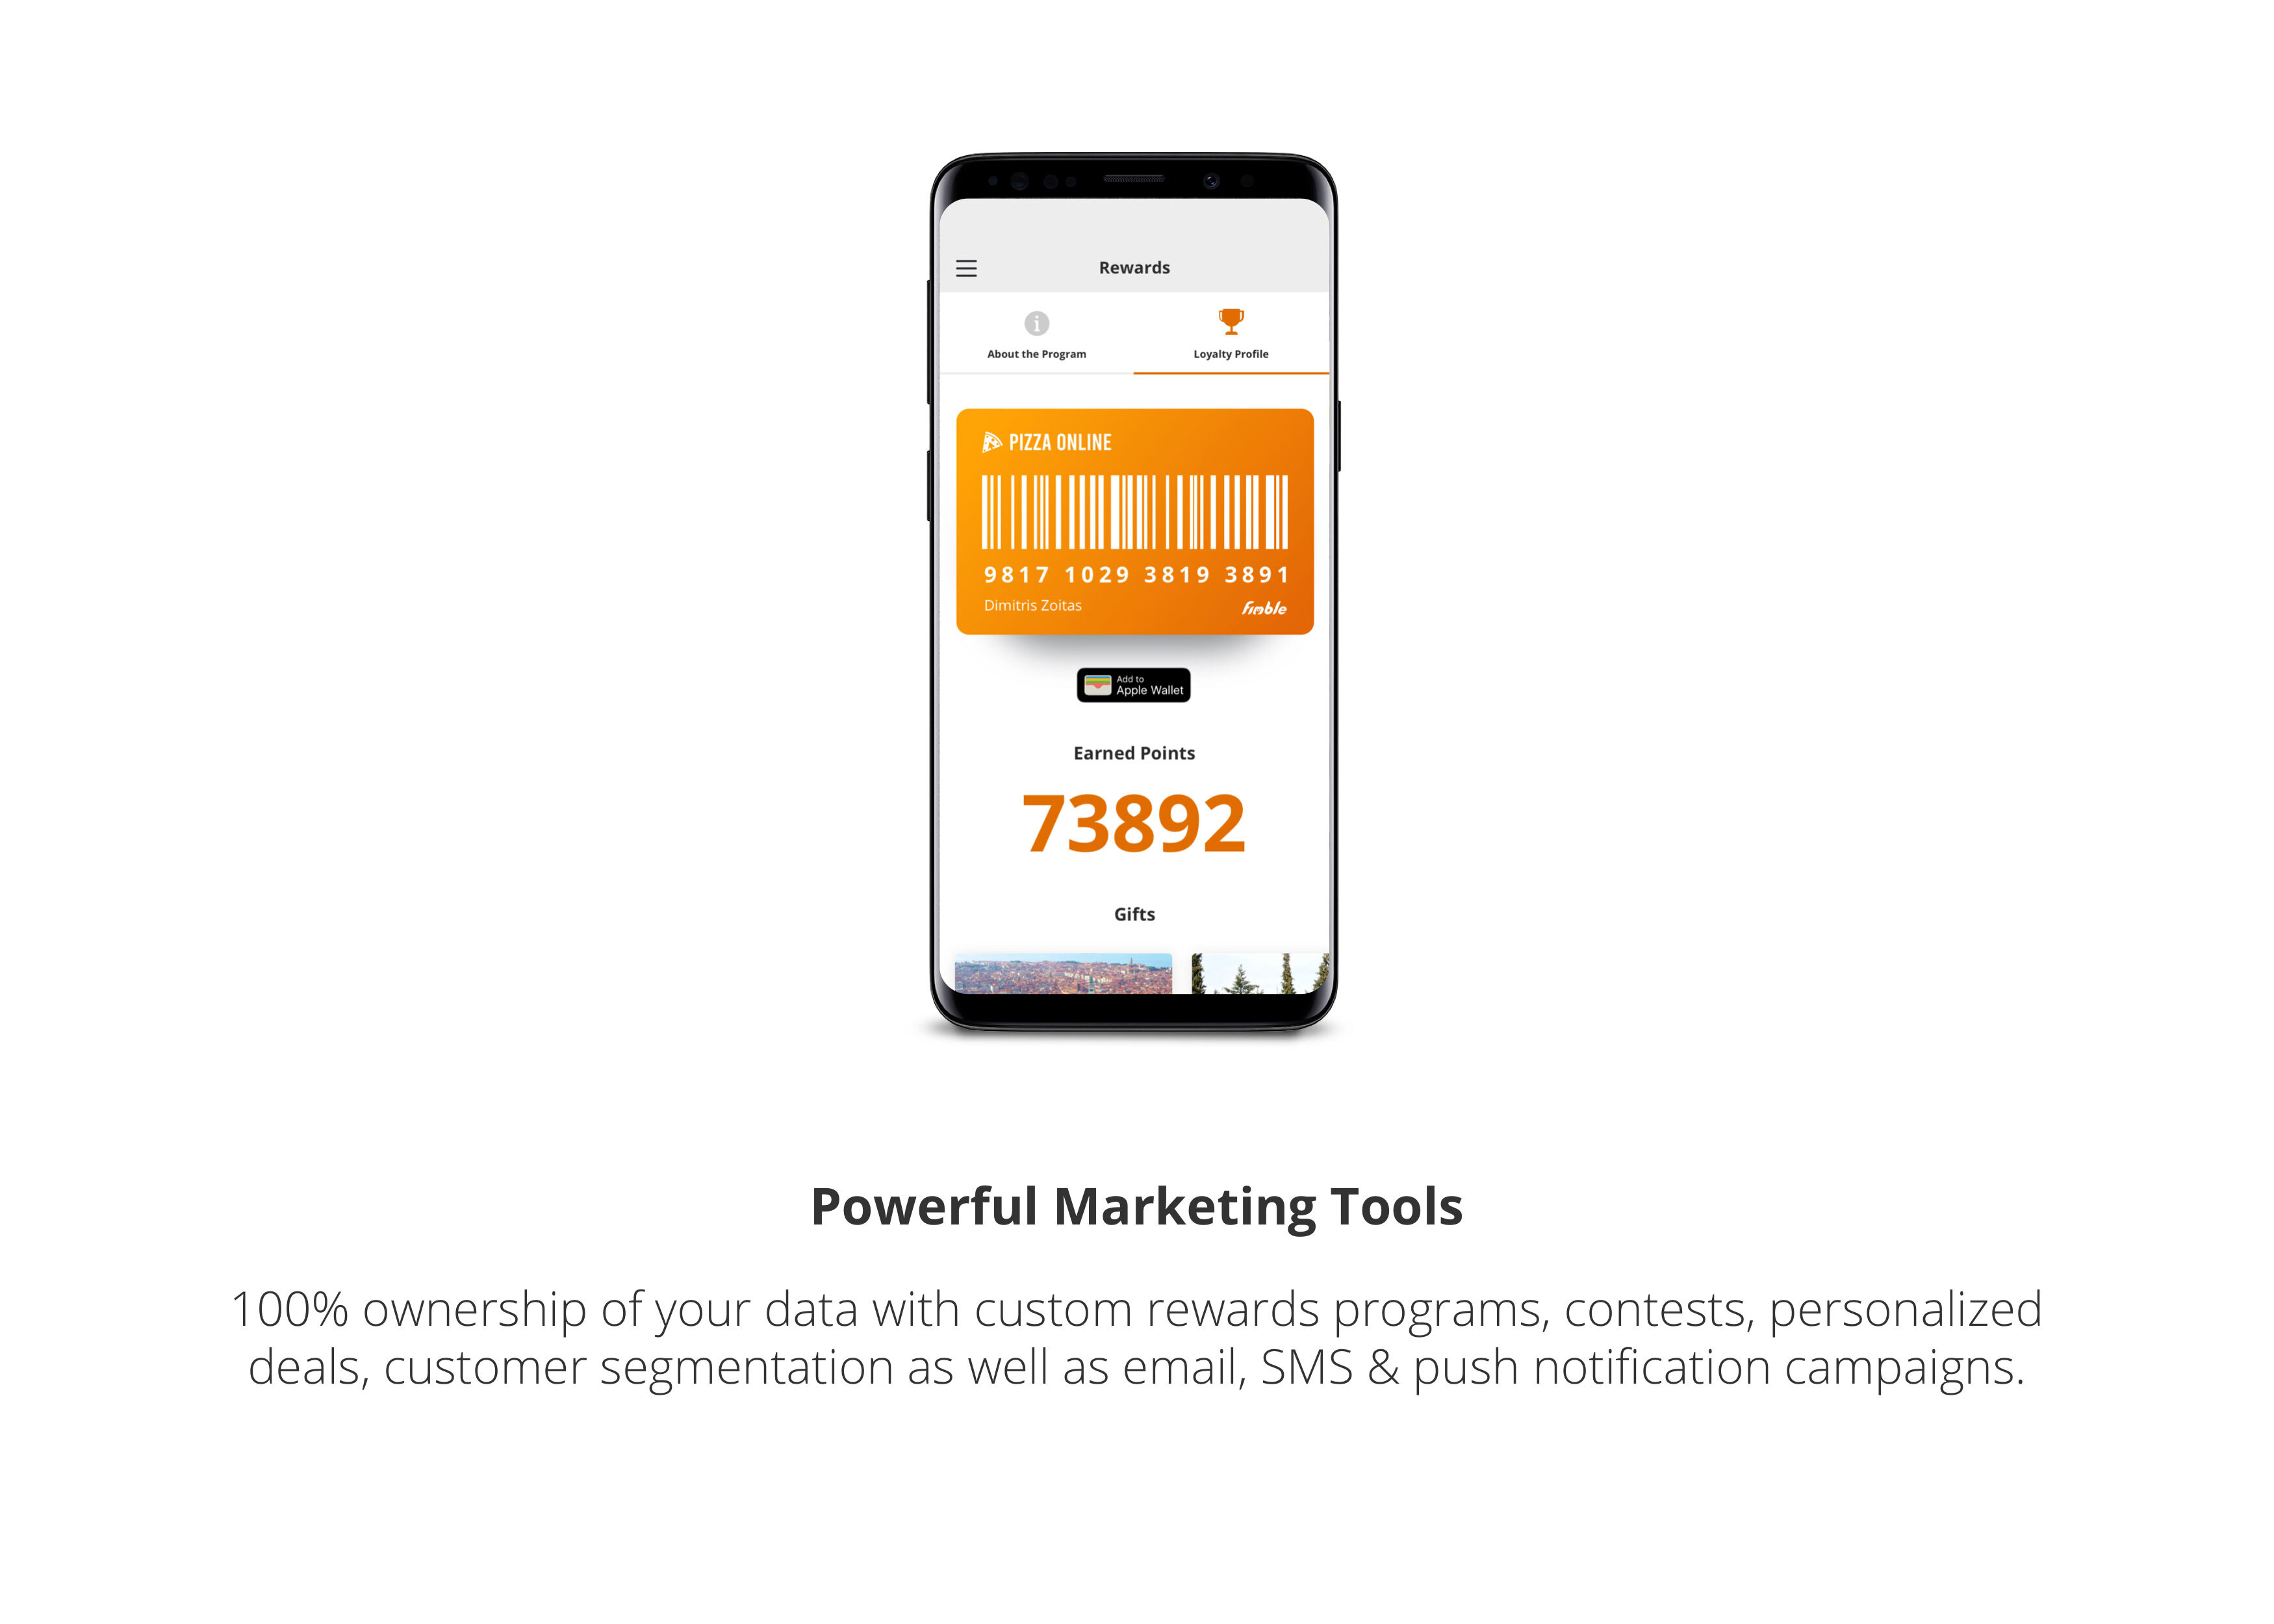 Powerful Marketing Tools